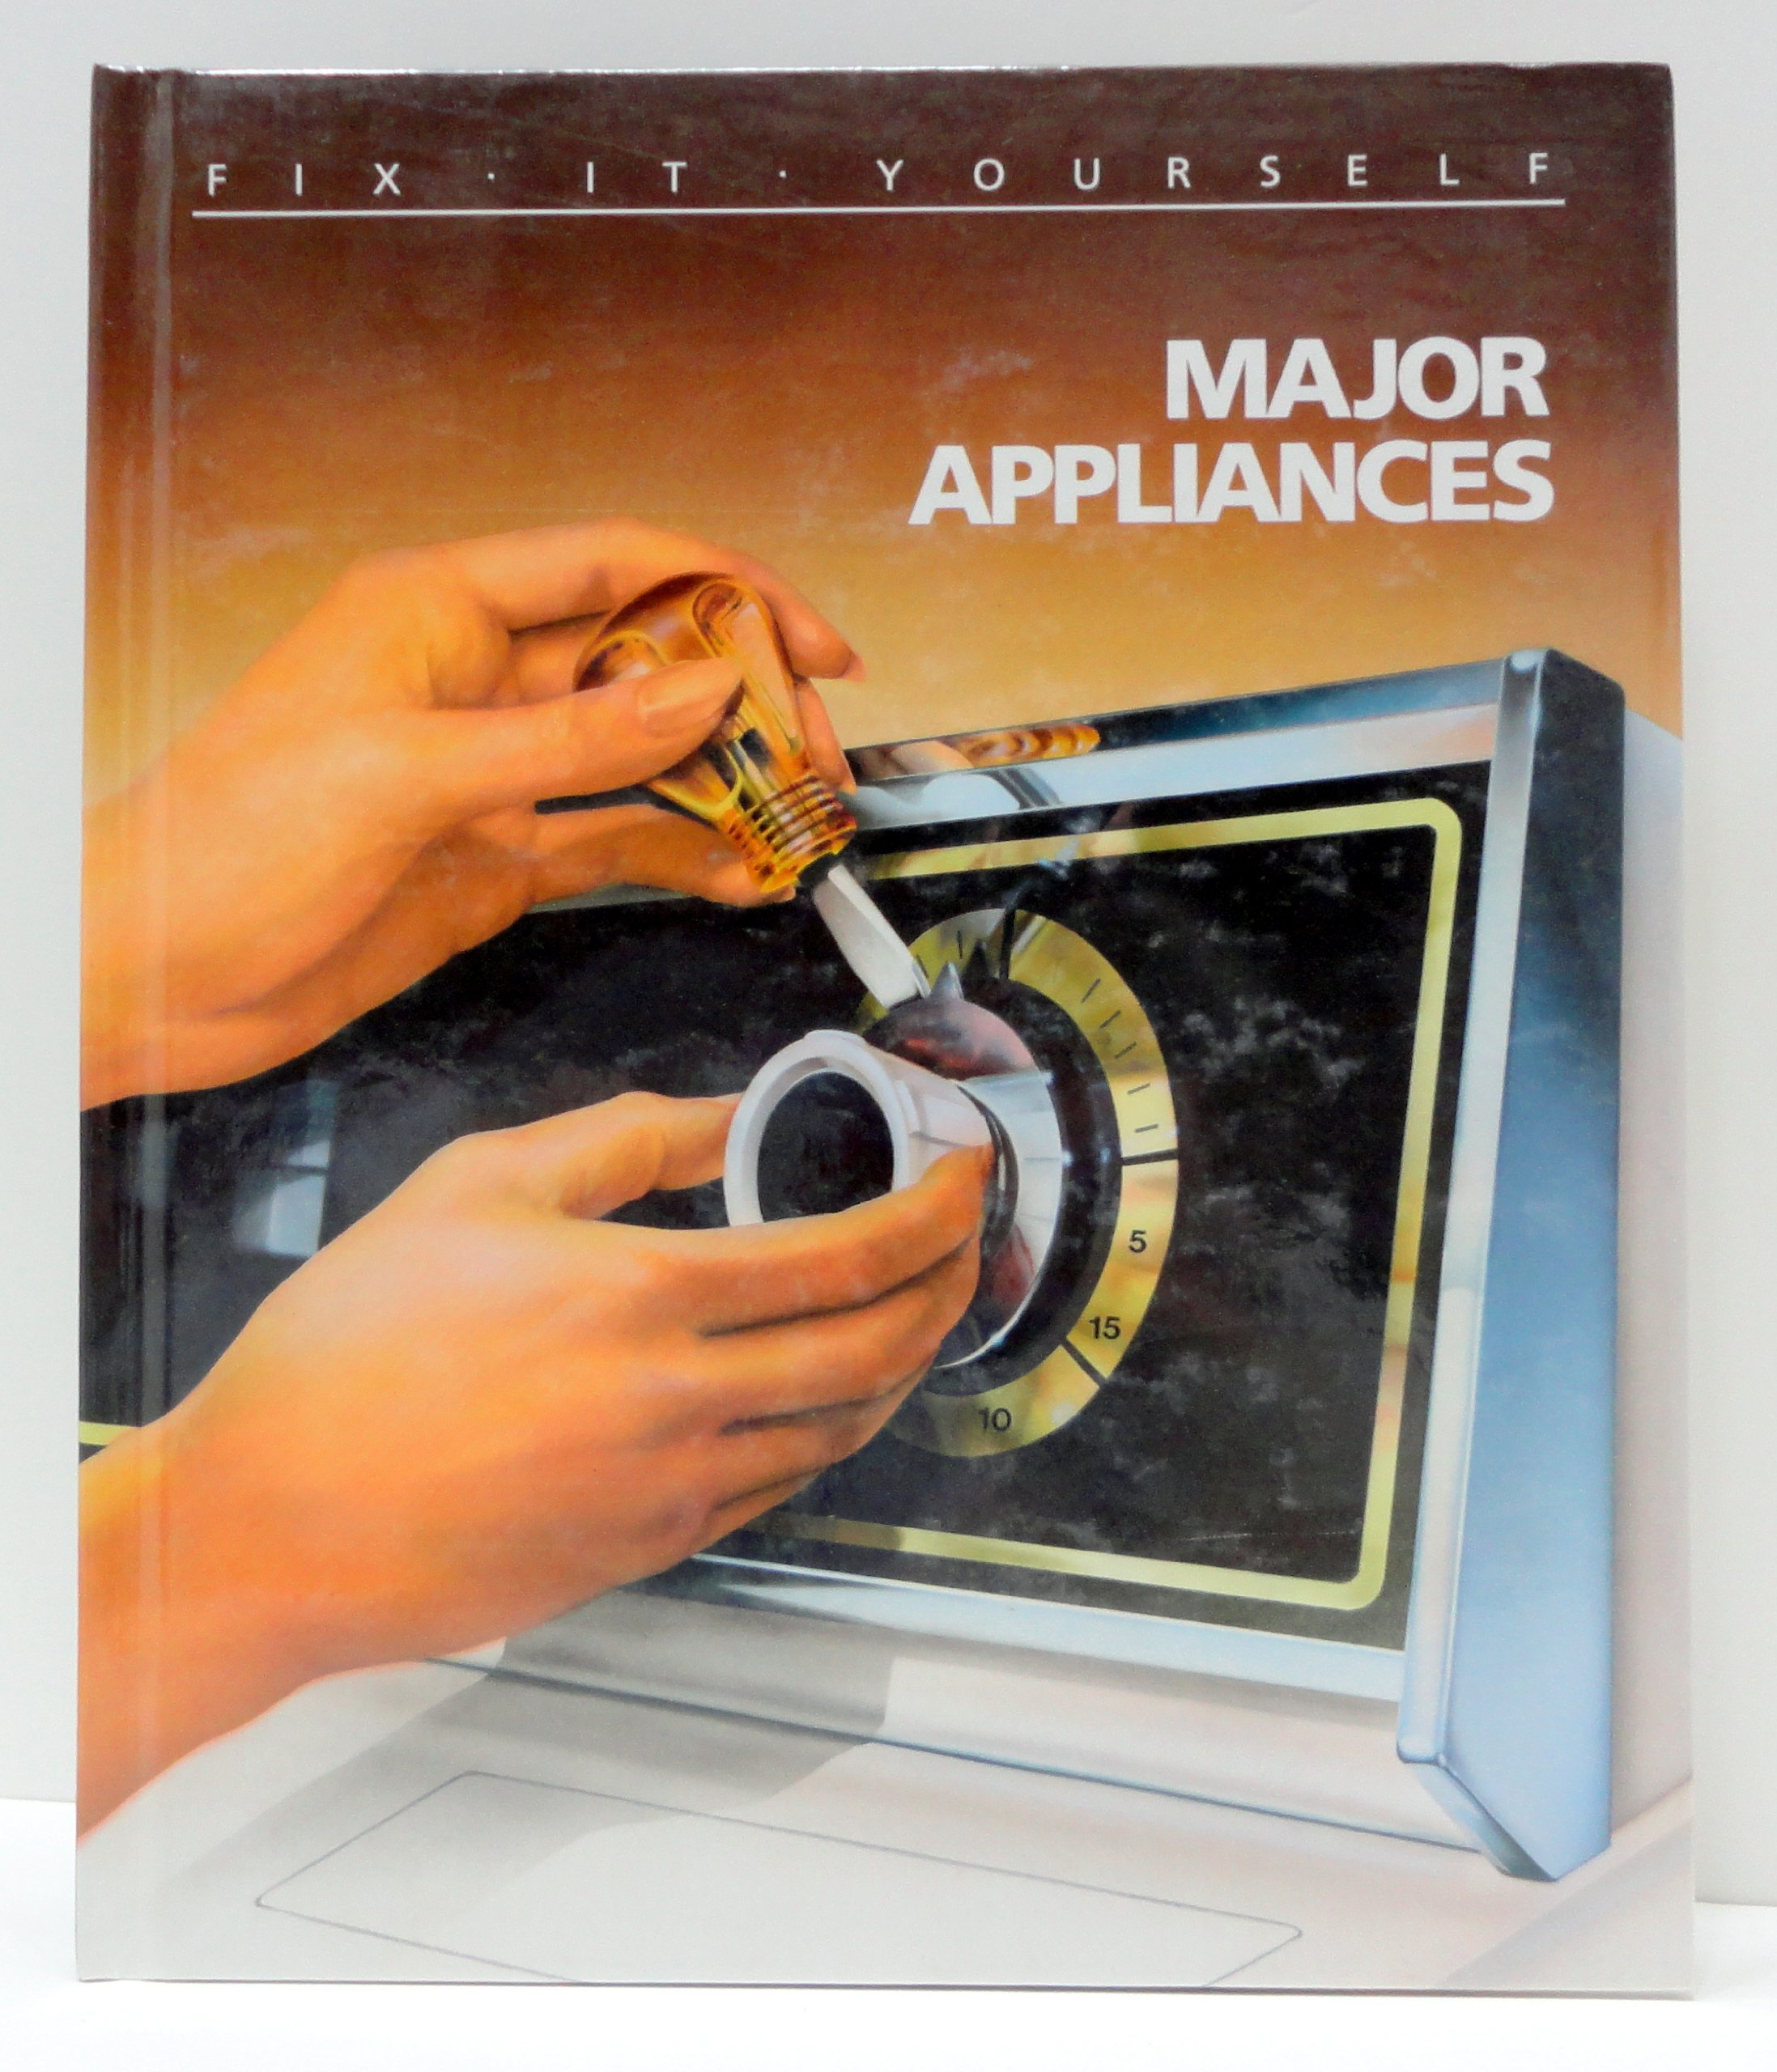 Major appliances fix it yourself time life books 9780809462049 major appliances fix it yourself time life books 9780809462049 amazon books solutioingenieria Image collections